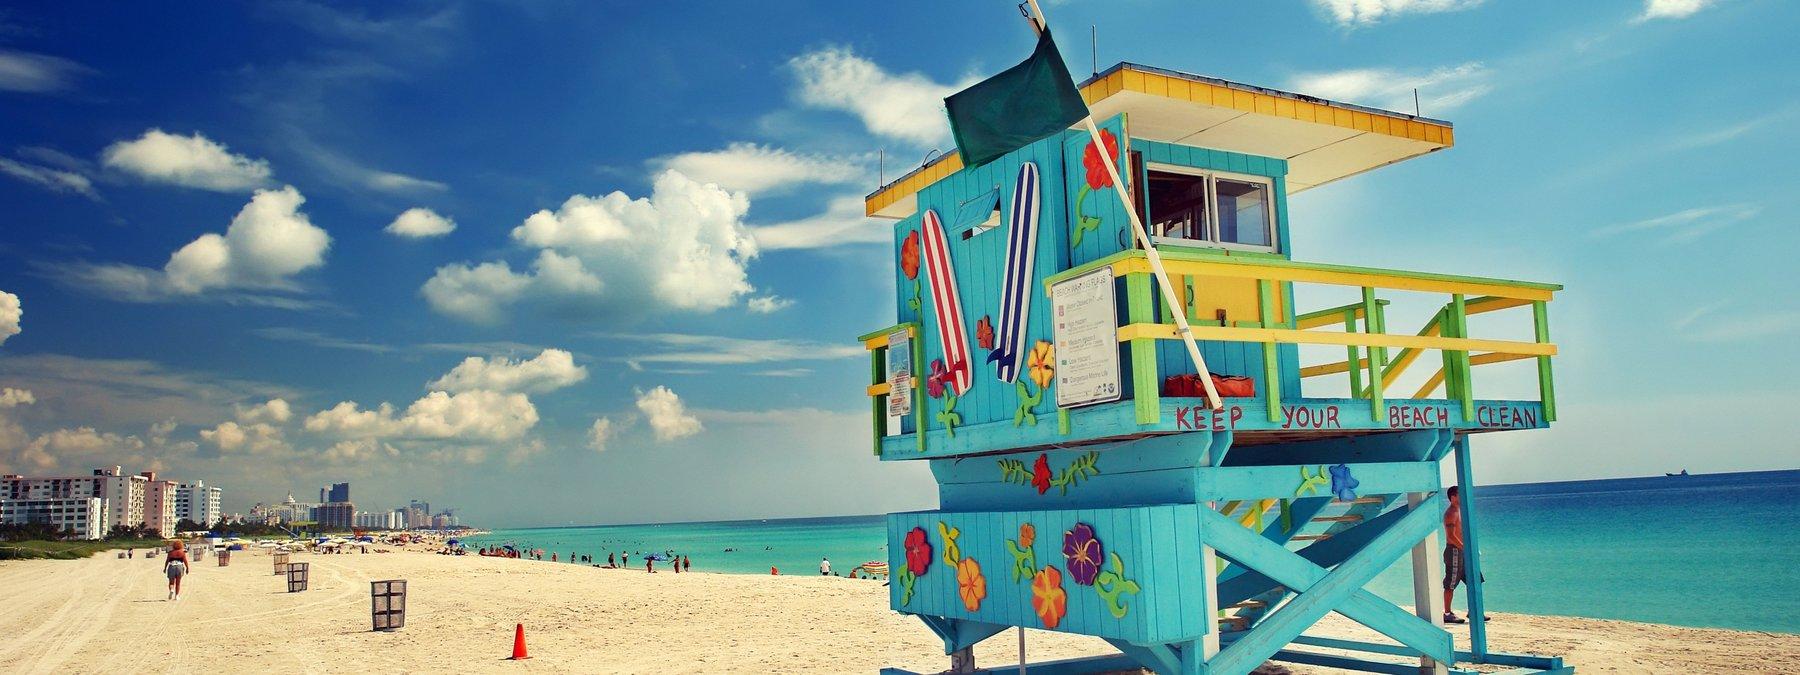 karibik, florida & mexiko - kreuzfahrt mit artania